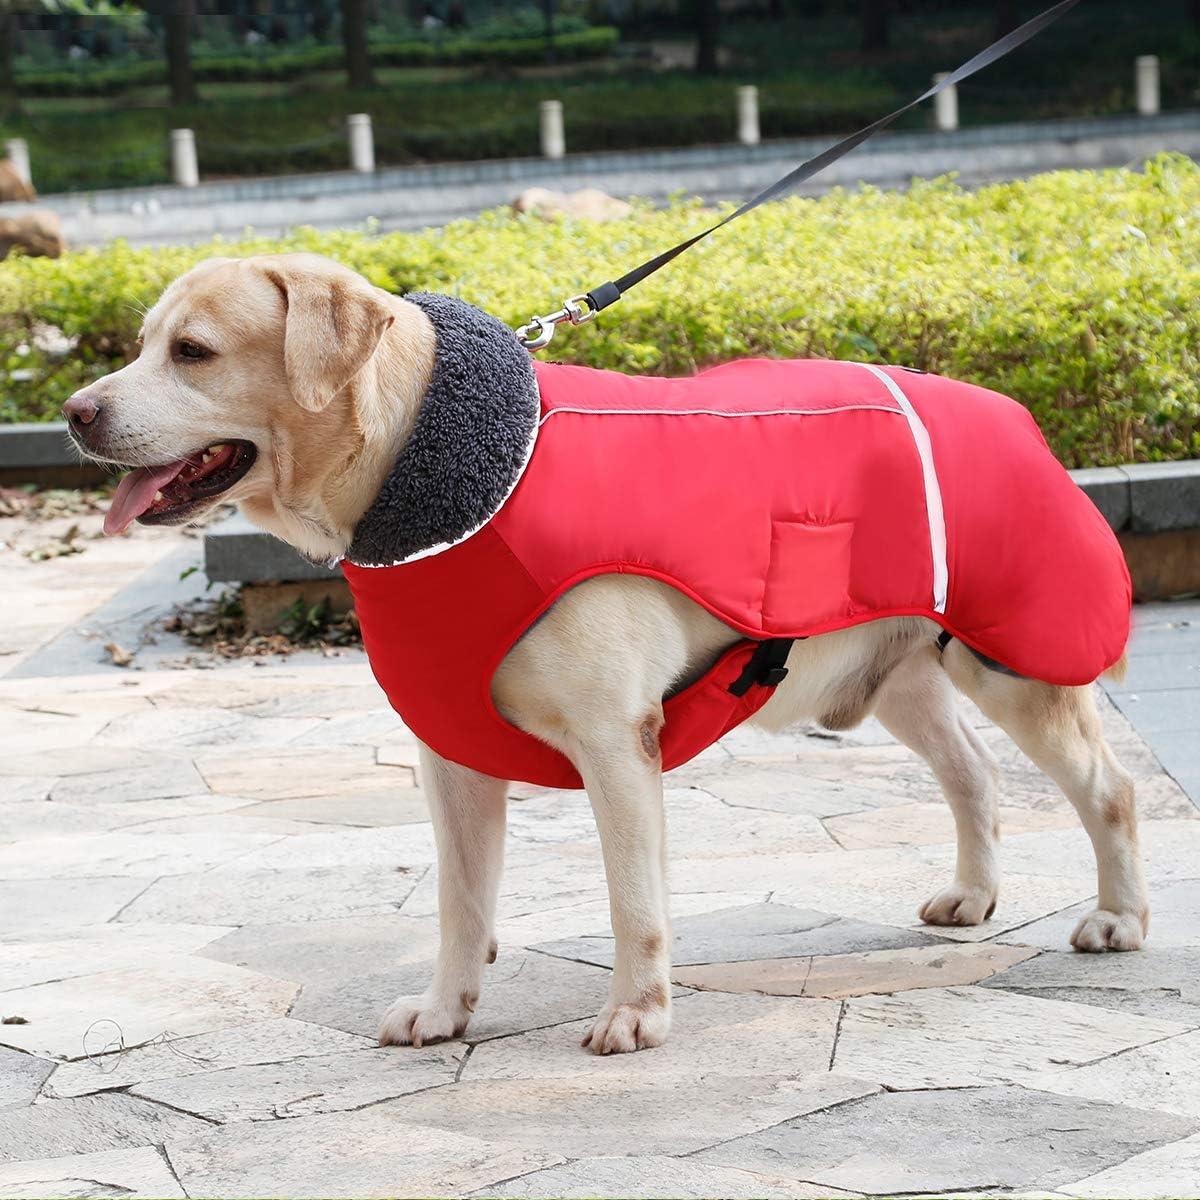 Wasserdicht Hundemantel Warm gepolstert Puffer Weste Welpen Regenmantel mit Fleece f/ür Hunde Gr/ö/ße S Bis 3XL TFENG Reflektierend Hundejacke